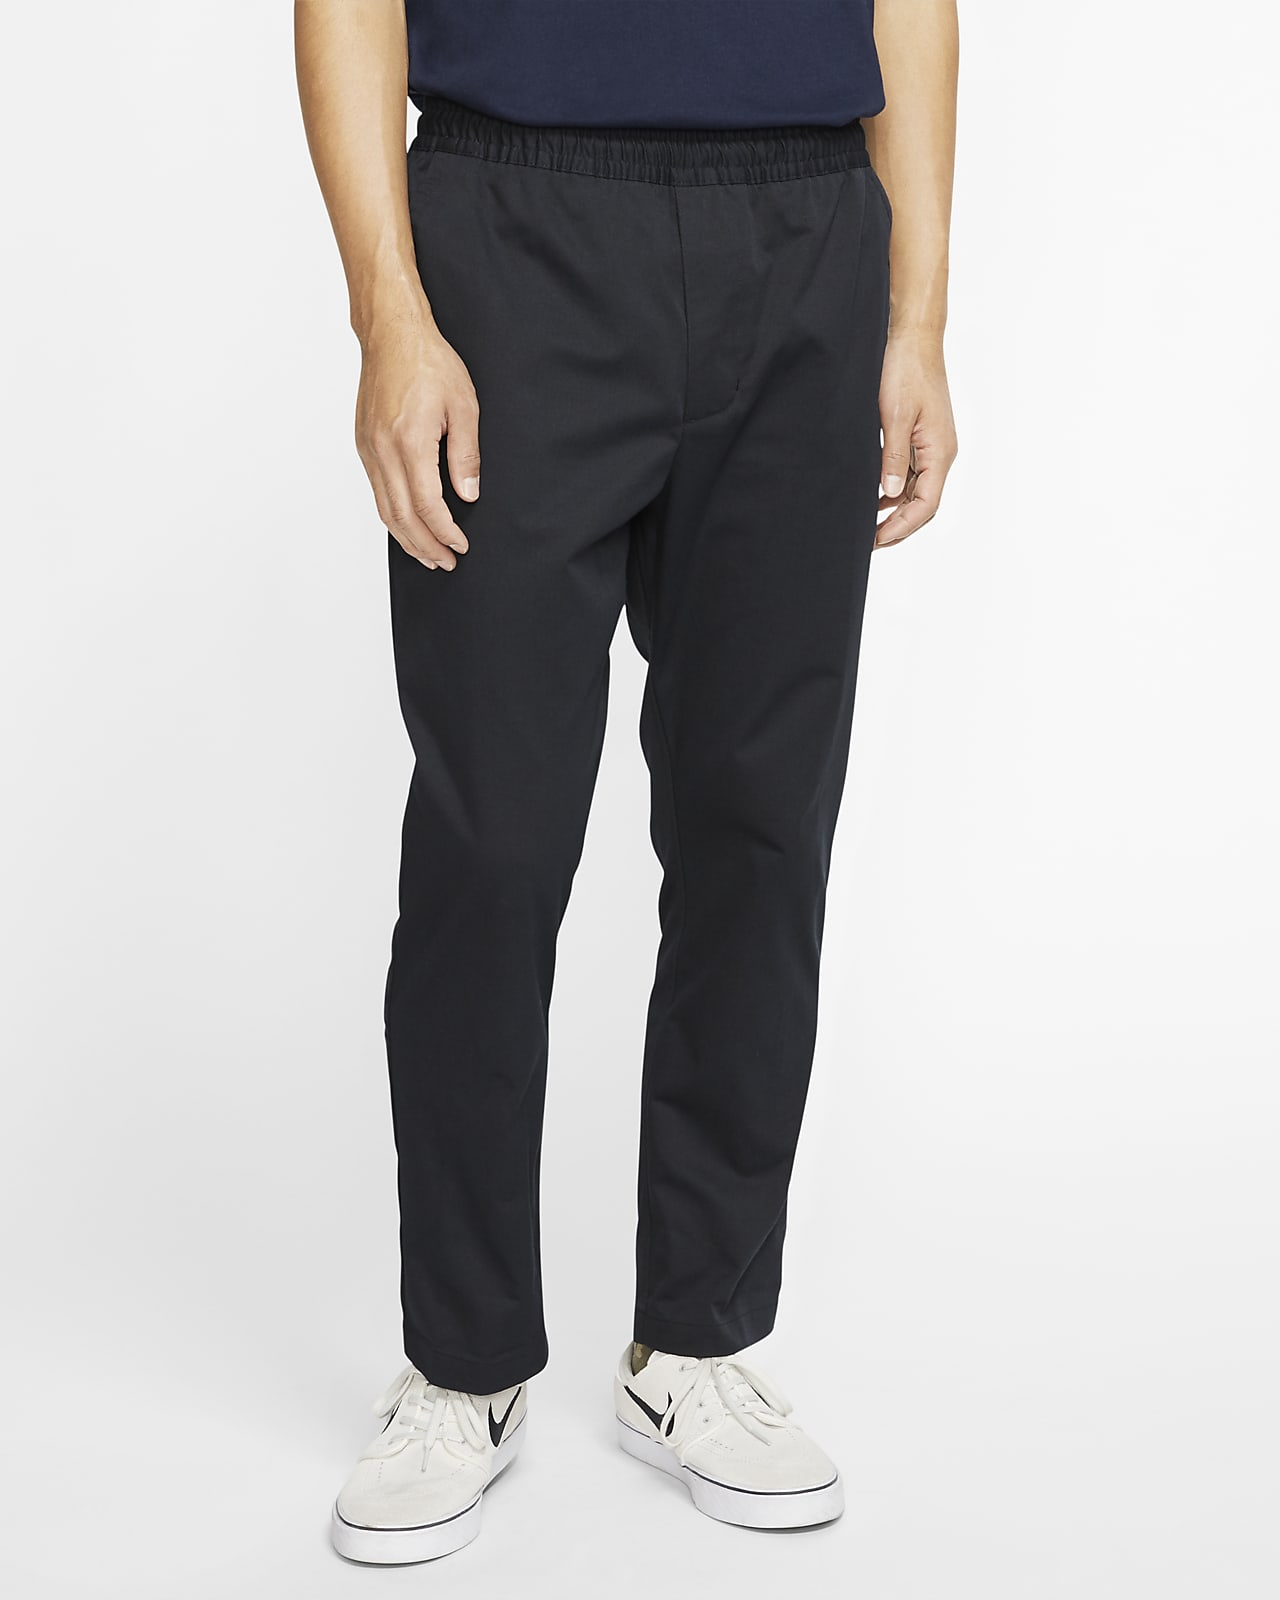 Nike SB Dri-FIT Pantalón chino de skateboard - Hombre